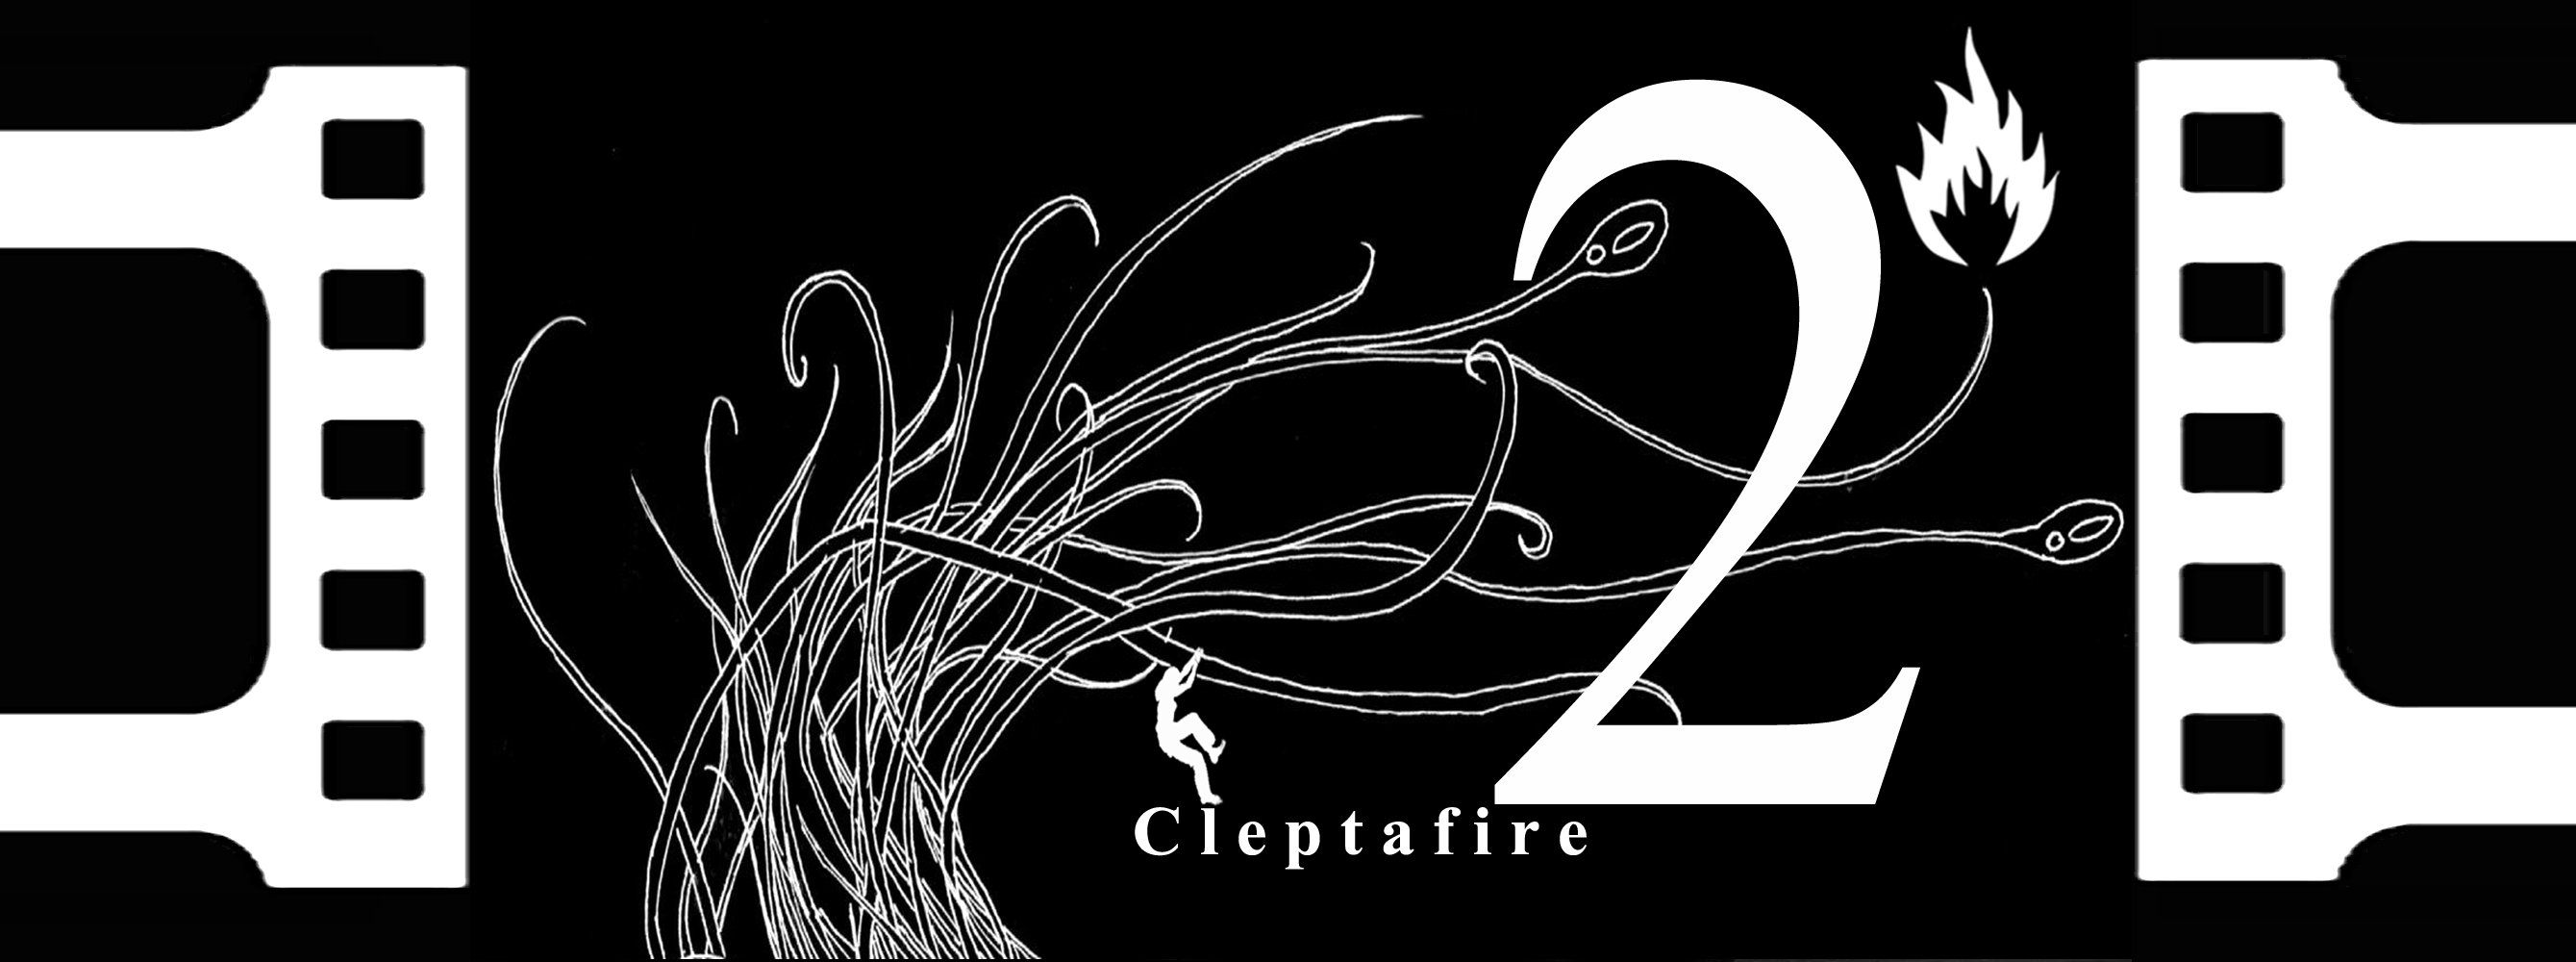 Cleptafire #2